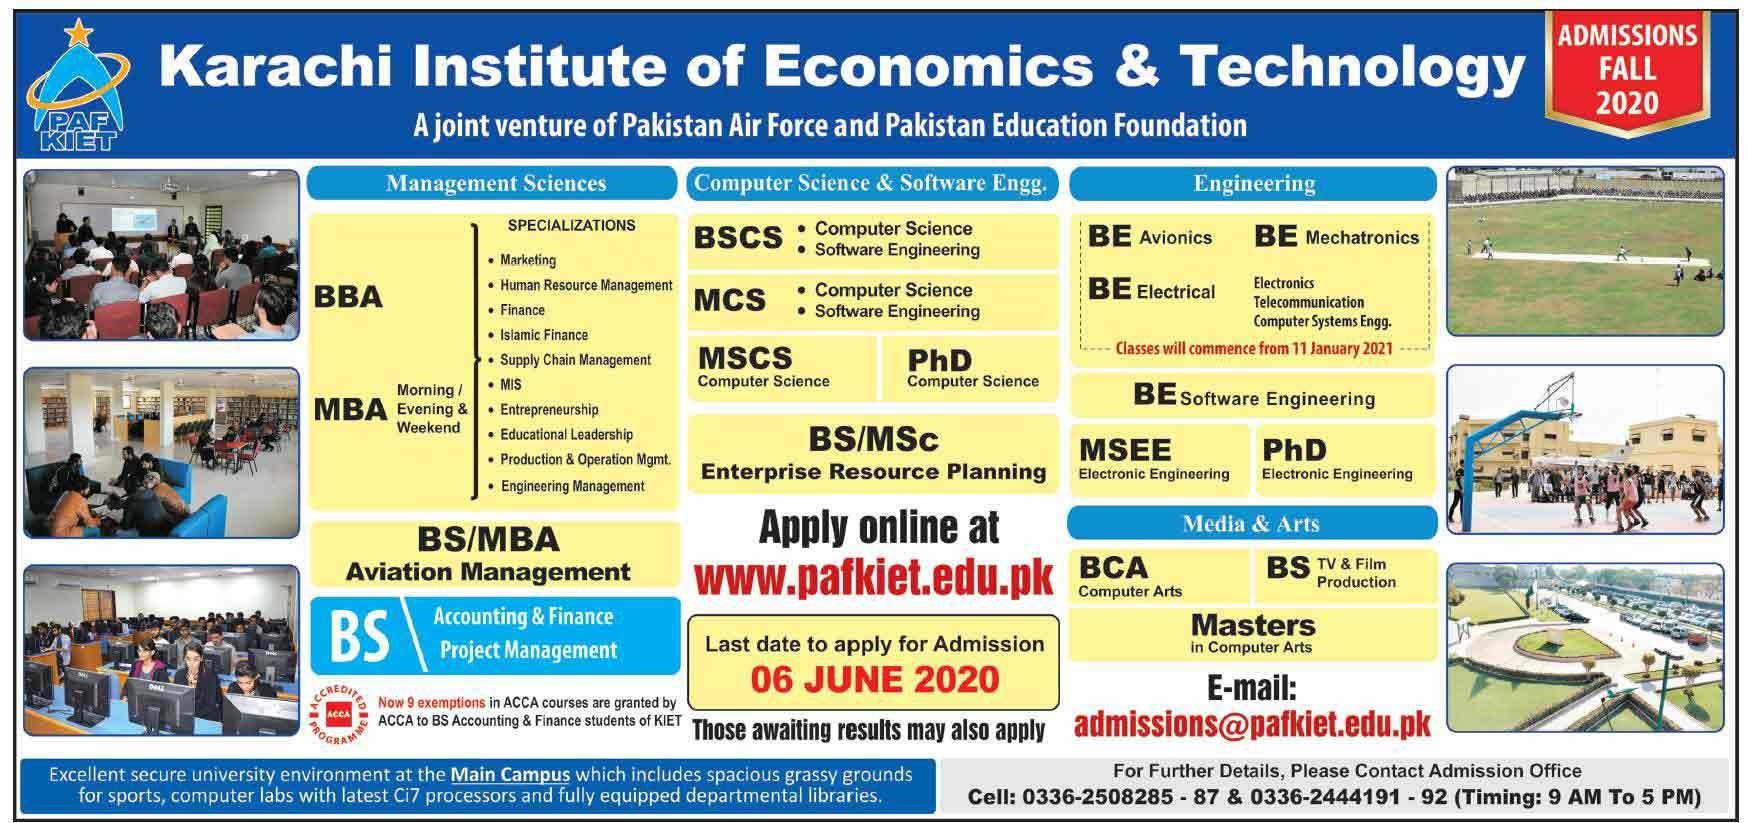 PAF-KIET-Admission-Karachi-2020-Last-Date